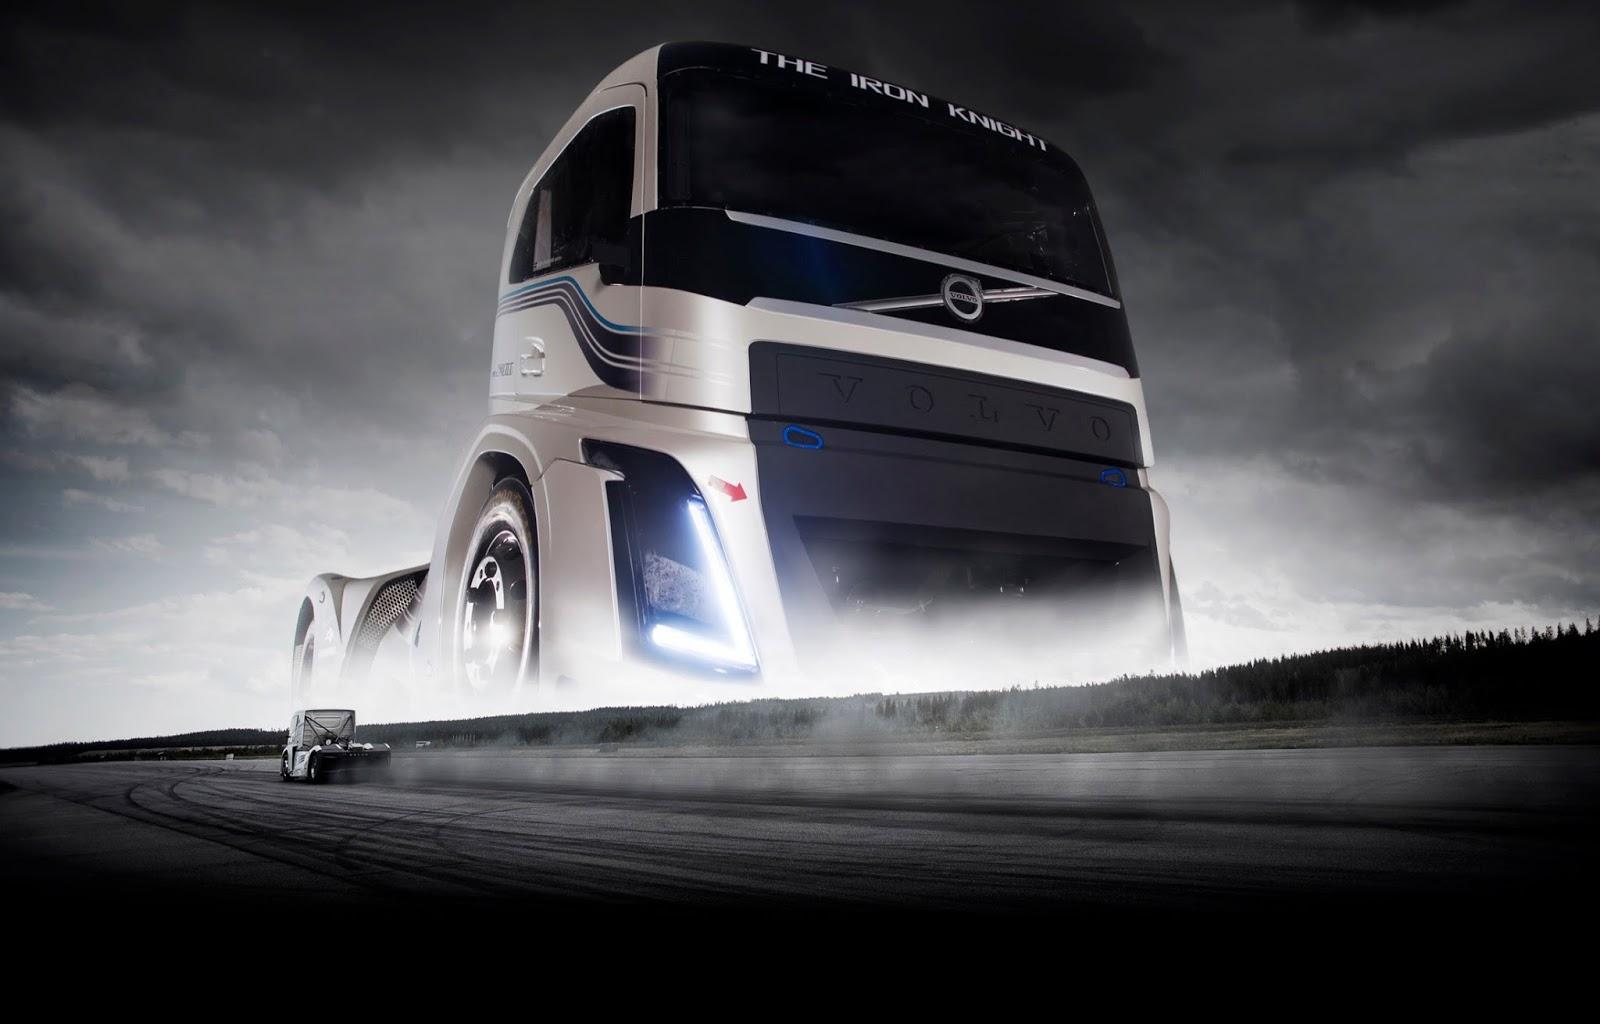 iron knigth Το Iron Knight της Volvo Trucks είναι το ταχύτερο φορτηγό του κόσμου Fun, Record, topspeed, Truck, videos, Volvo Iron Knight, Volvo Trucks, Επαγγελματικά, Φορτηγά